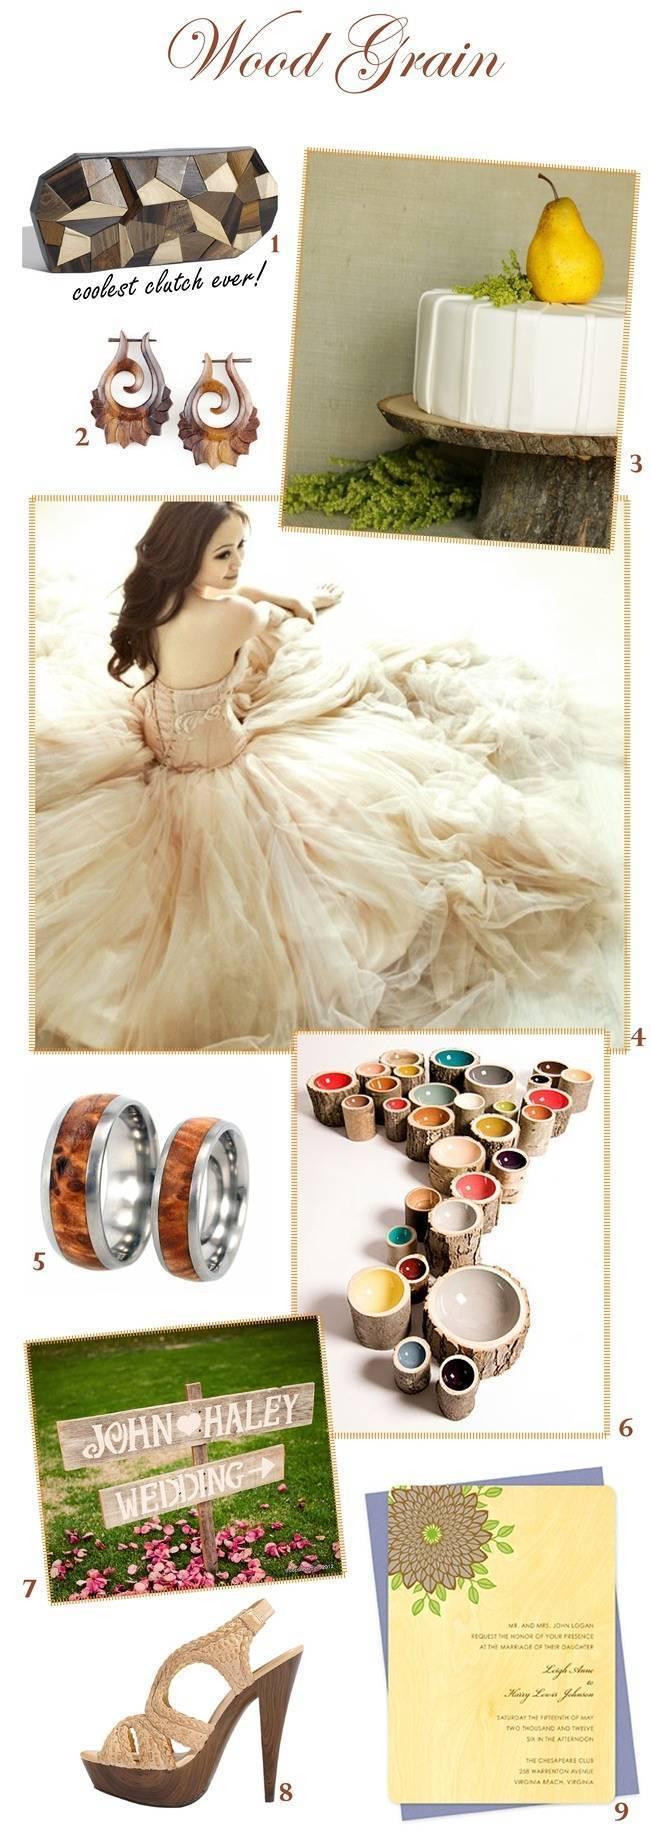 Wood Grain Wedding Inspiration